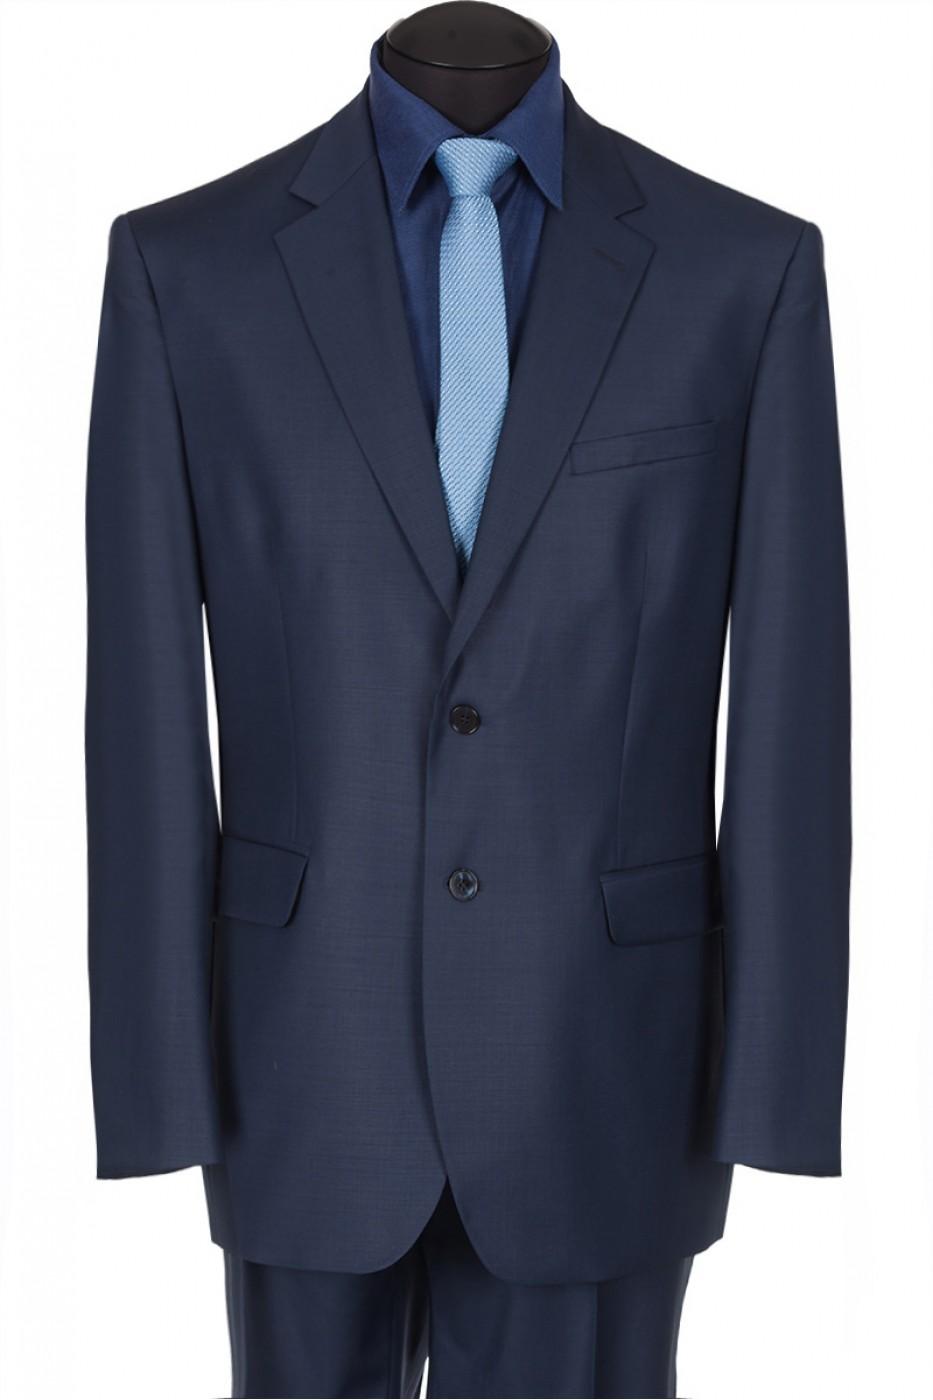 Тёмно-синий мужской костюм 1321*S JAGUAR LUX